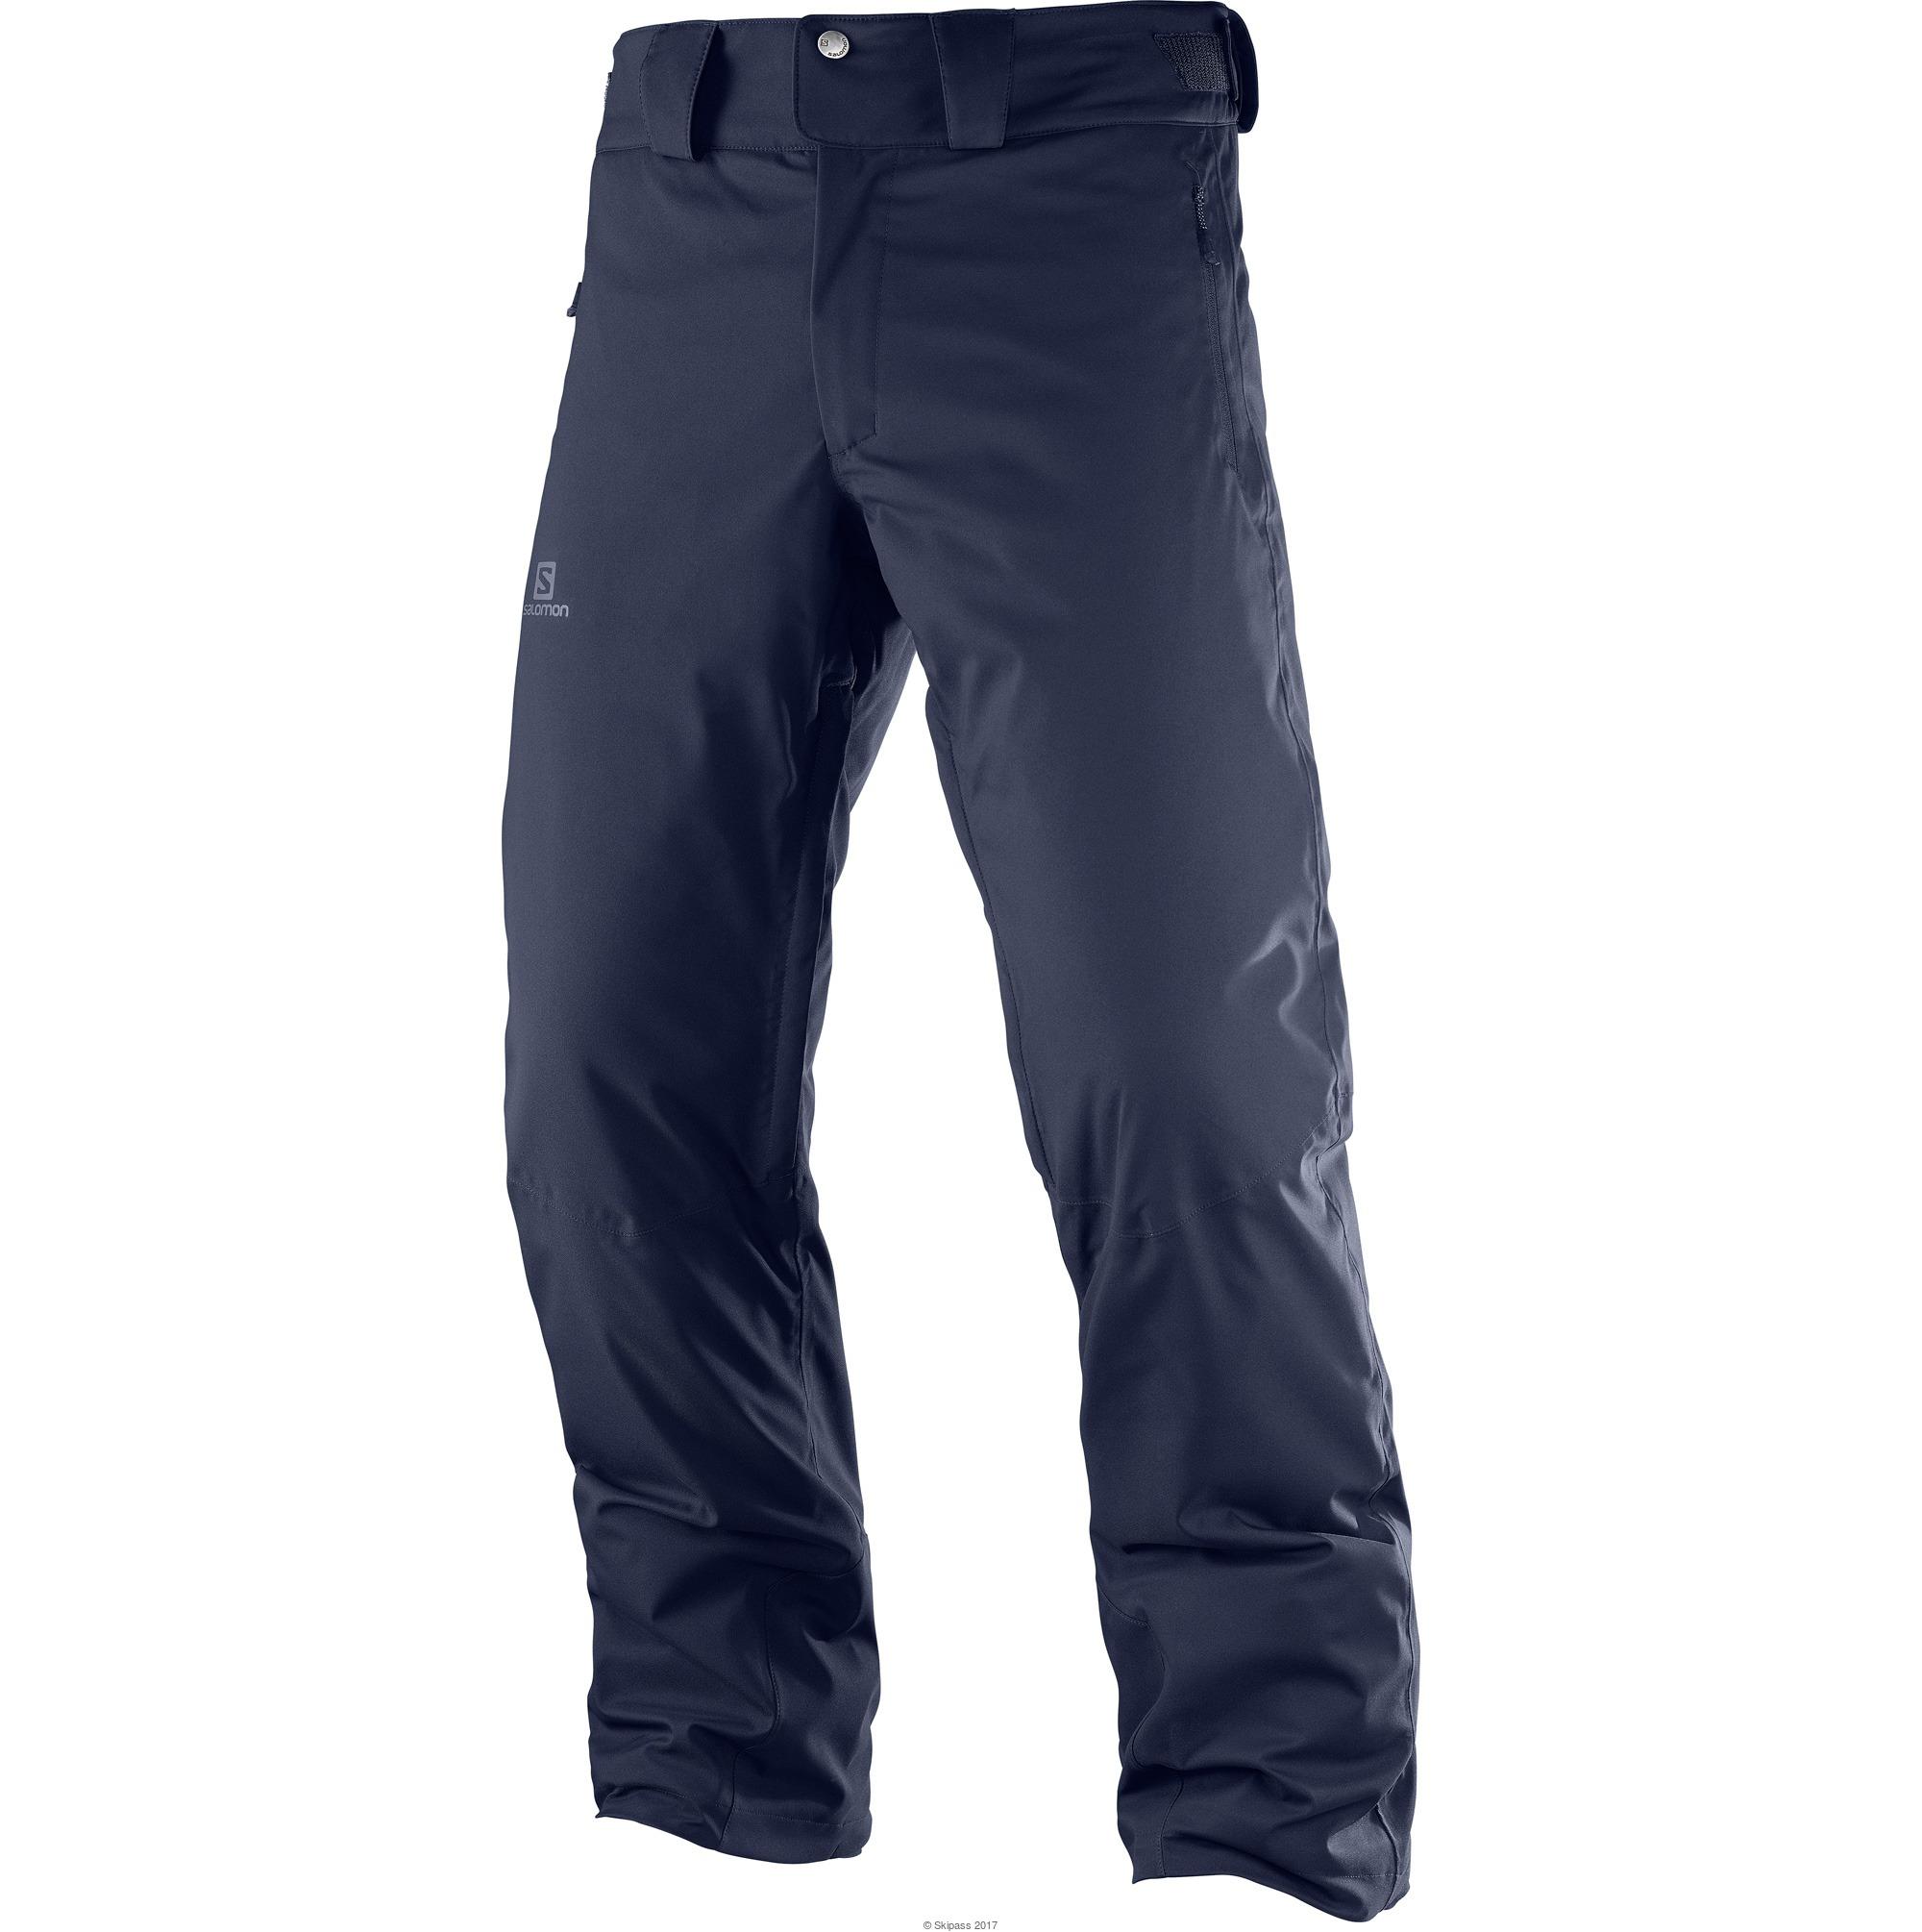 Pantalon Salomon stormrace